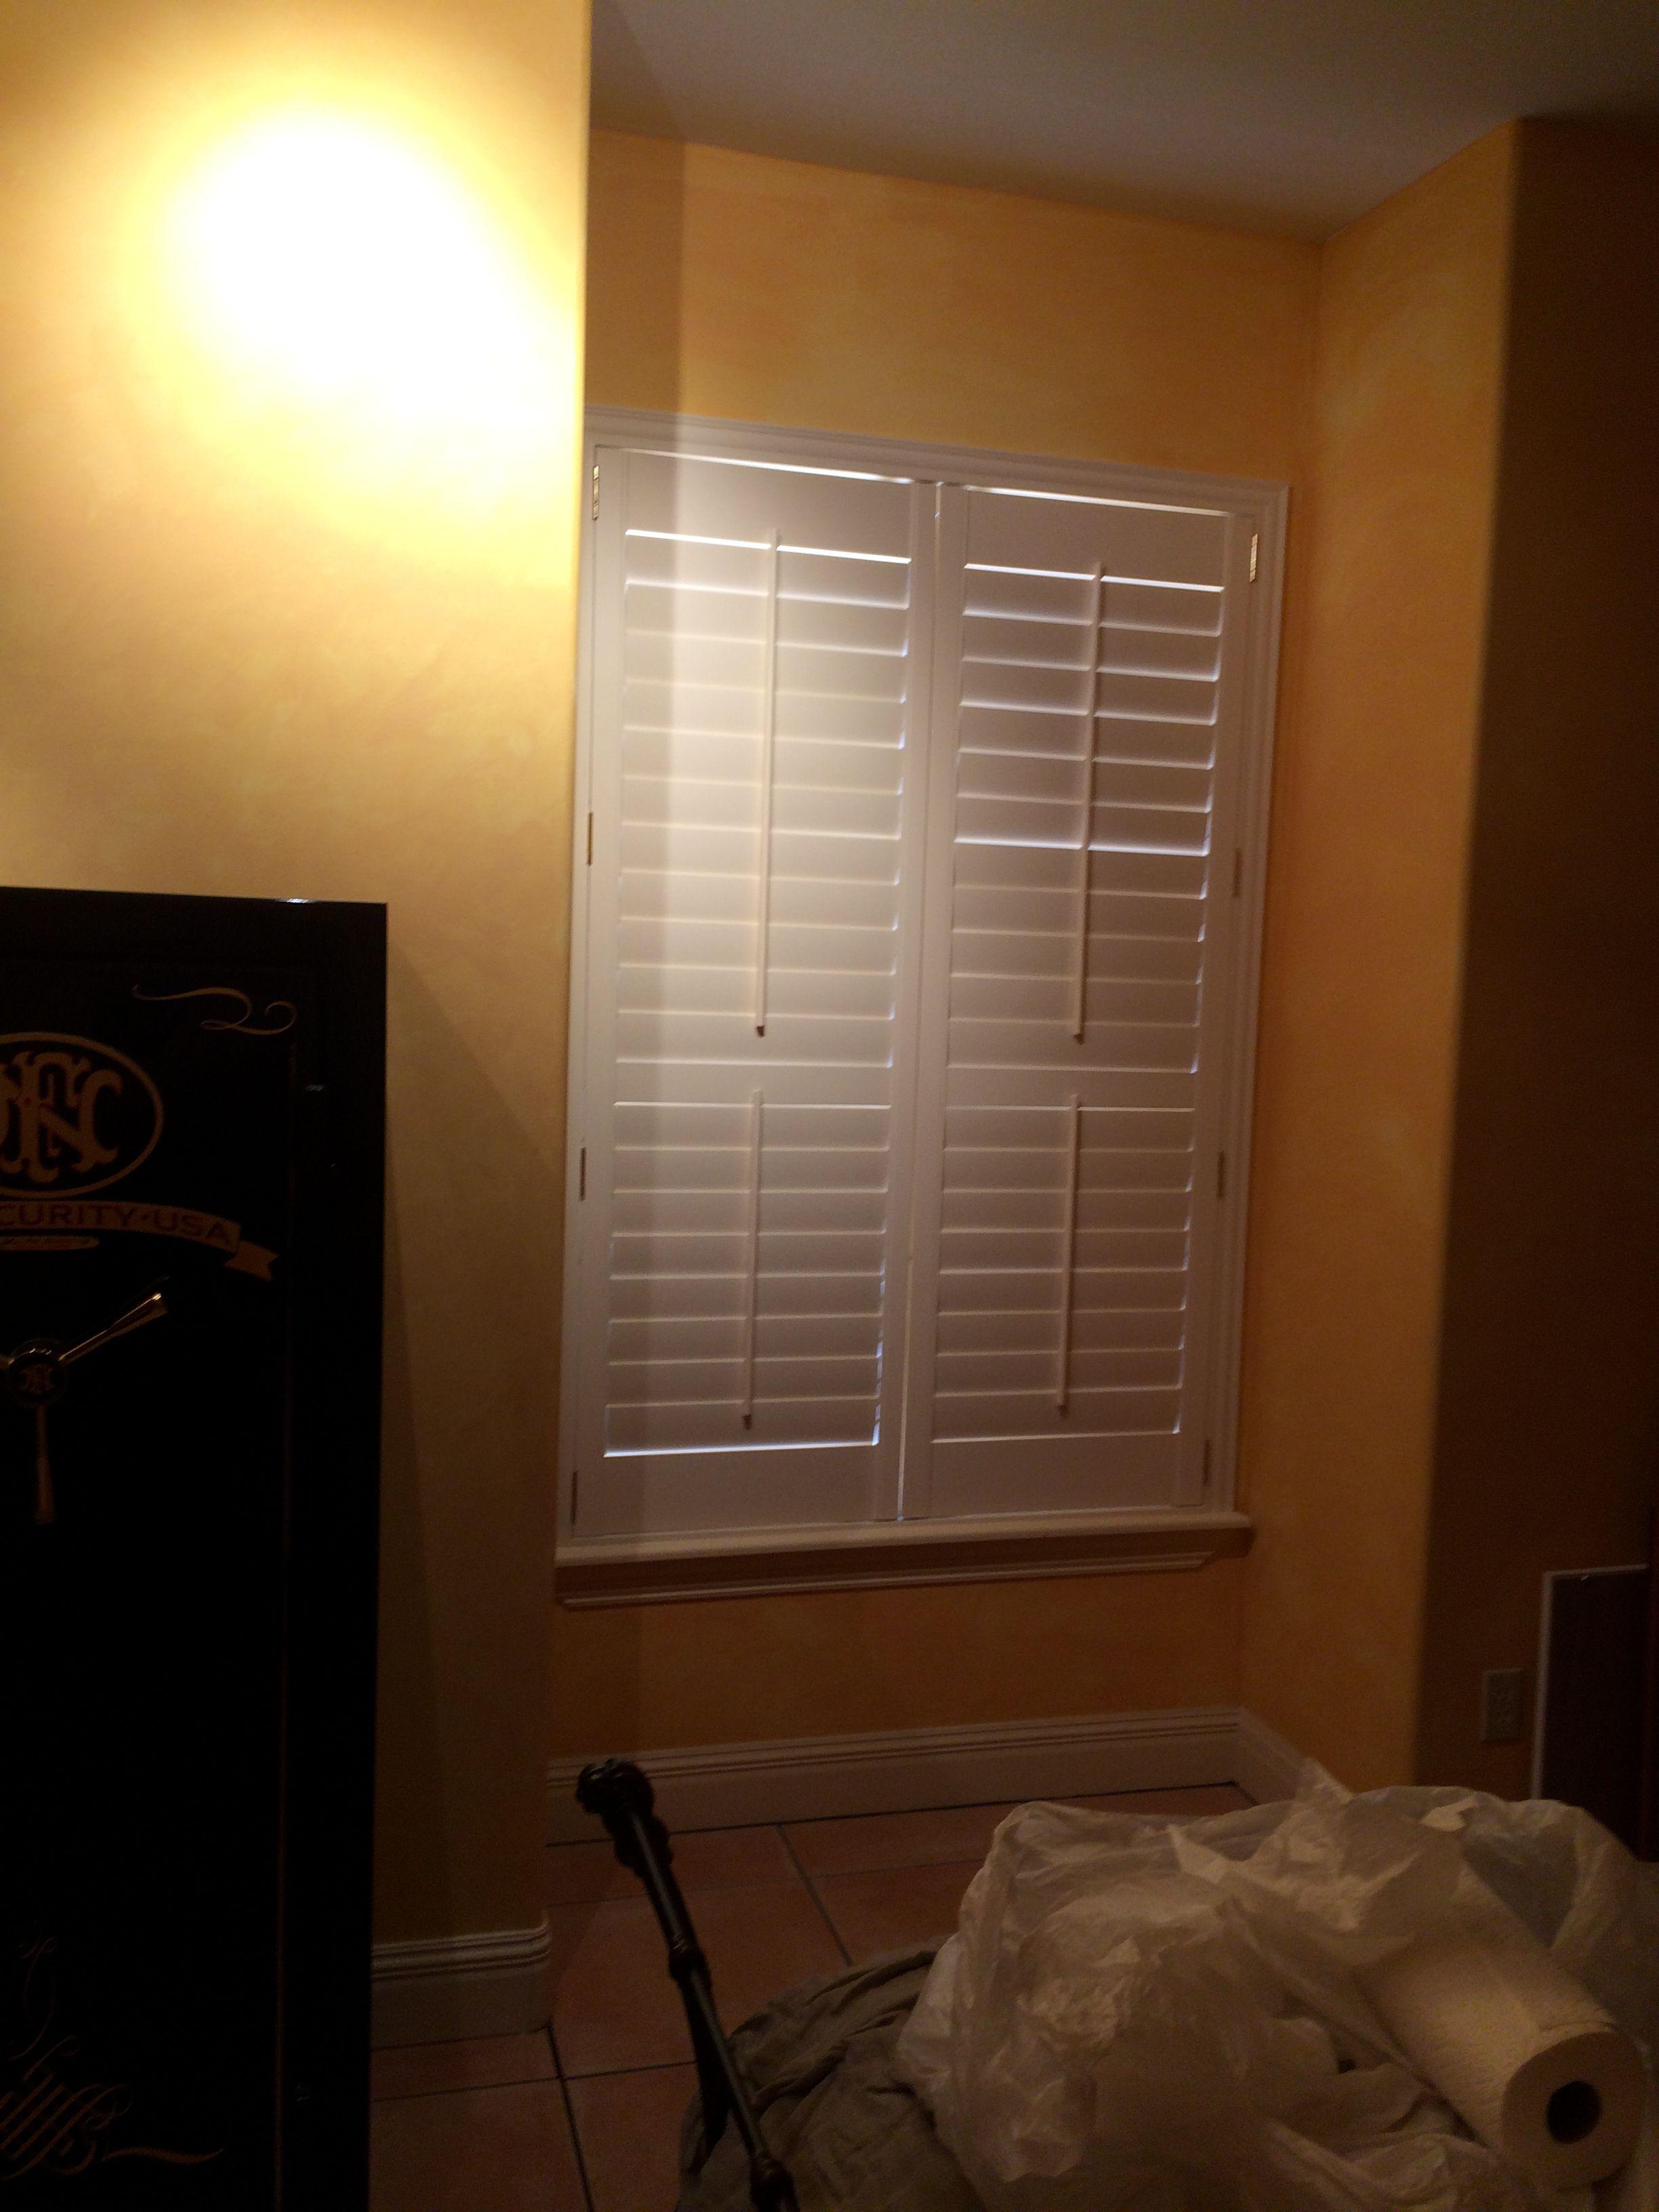 Window coverings shutters  custom shutters by austin blind faith providing high quality